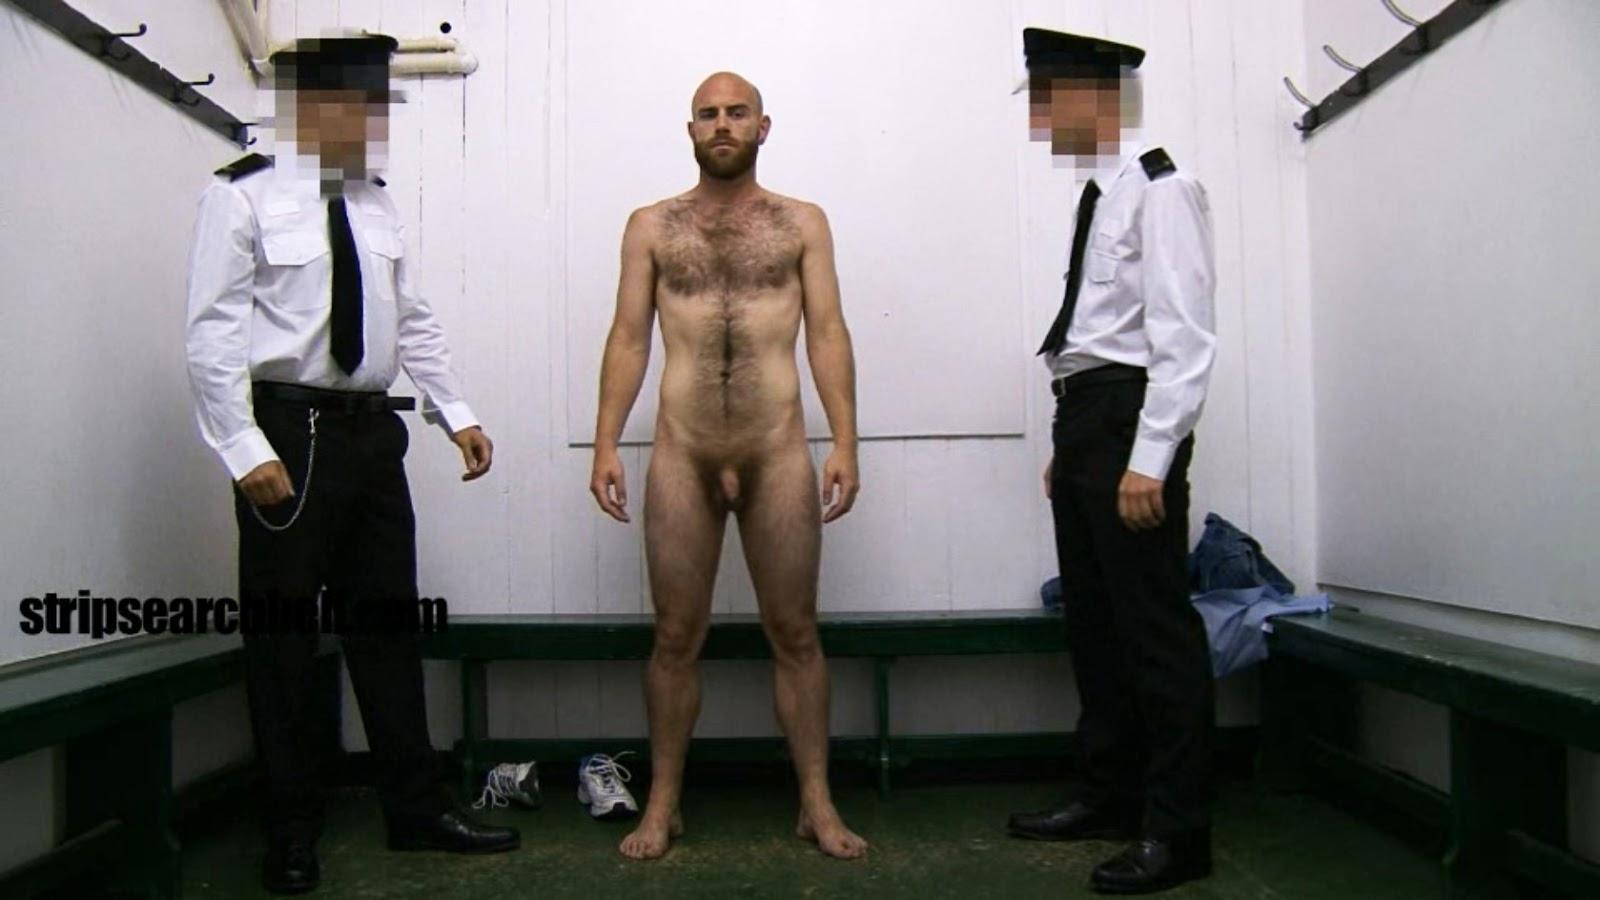 Lycos strip searches in prison